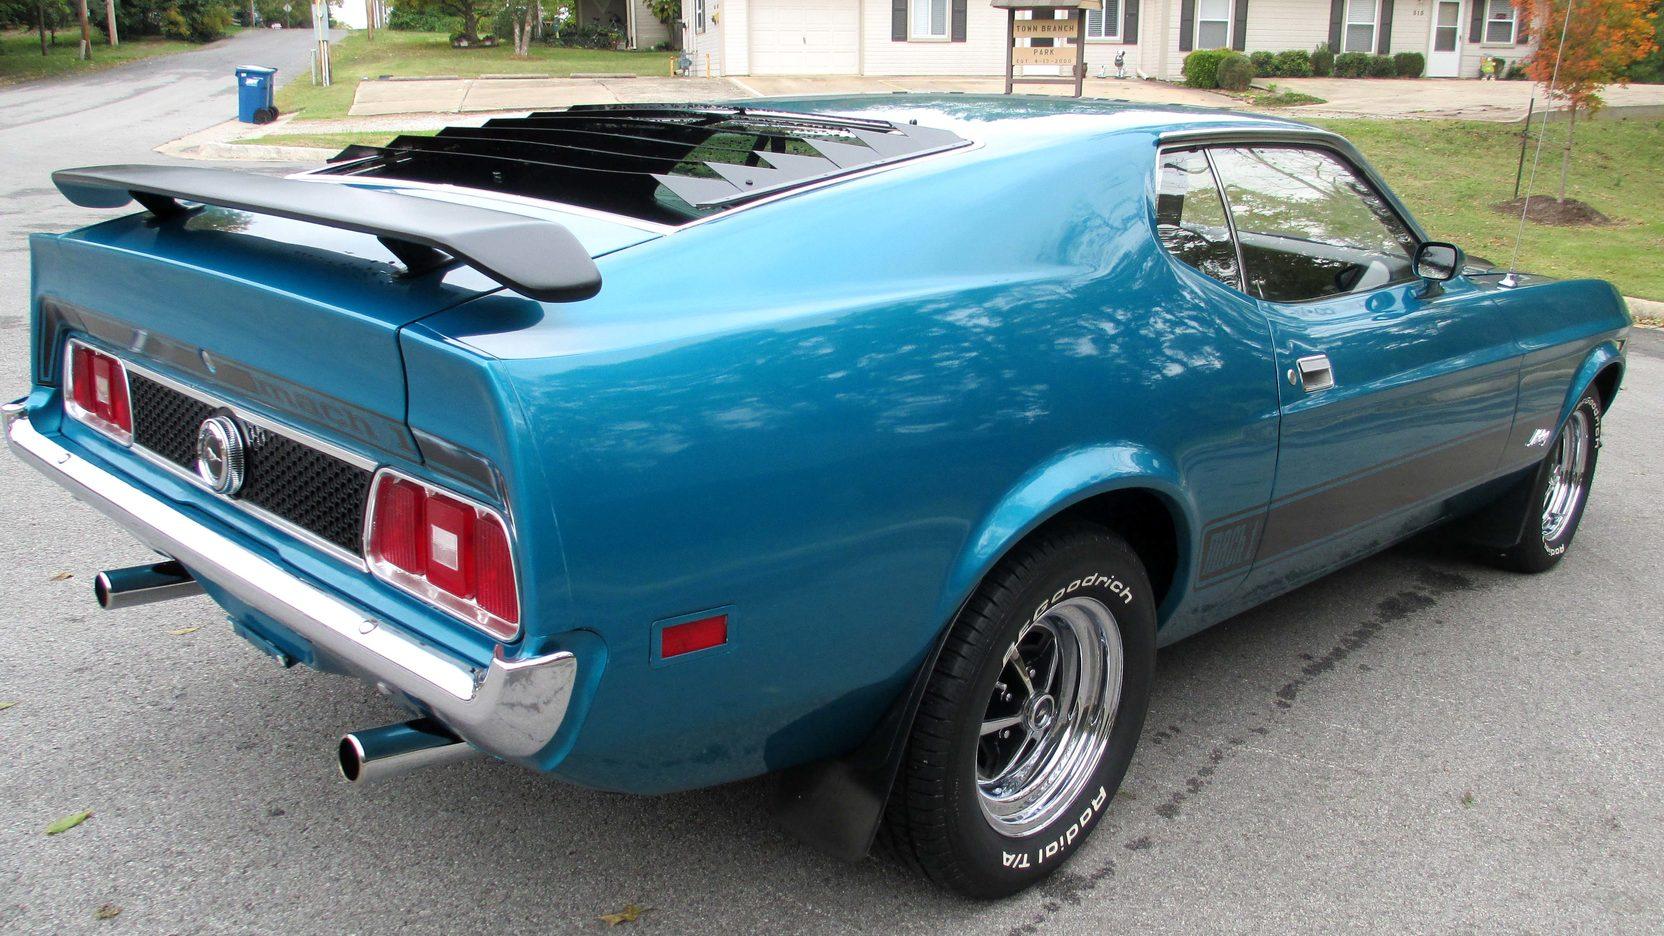 Clear, original green tint and custom grey. 1973 Ford Mustang Mach 1 Fastback S51 Kansas City 2013